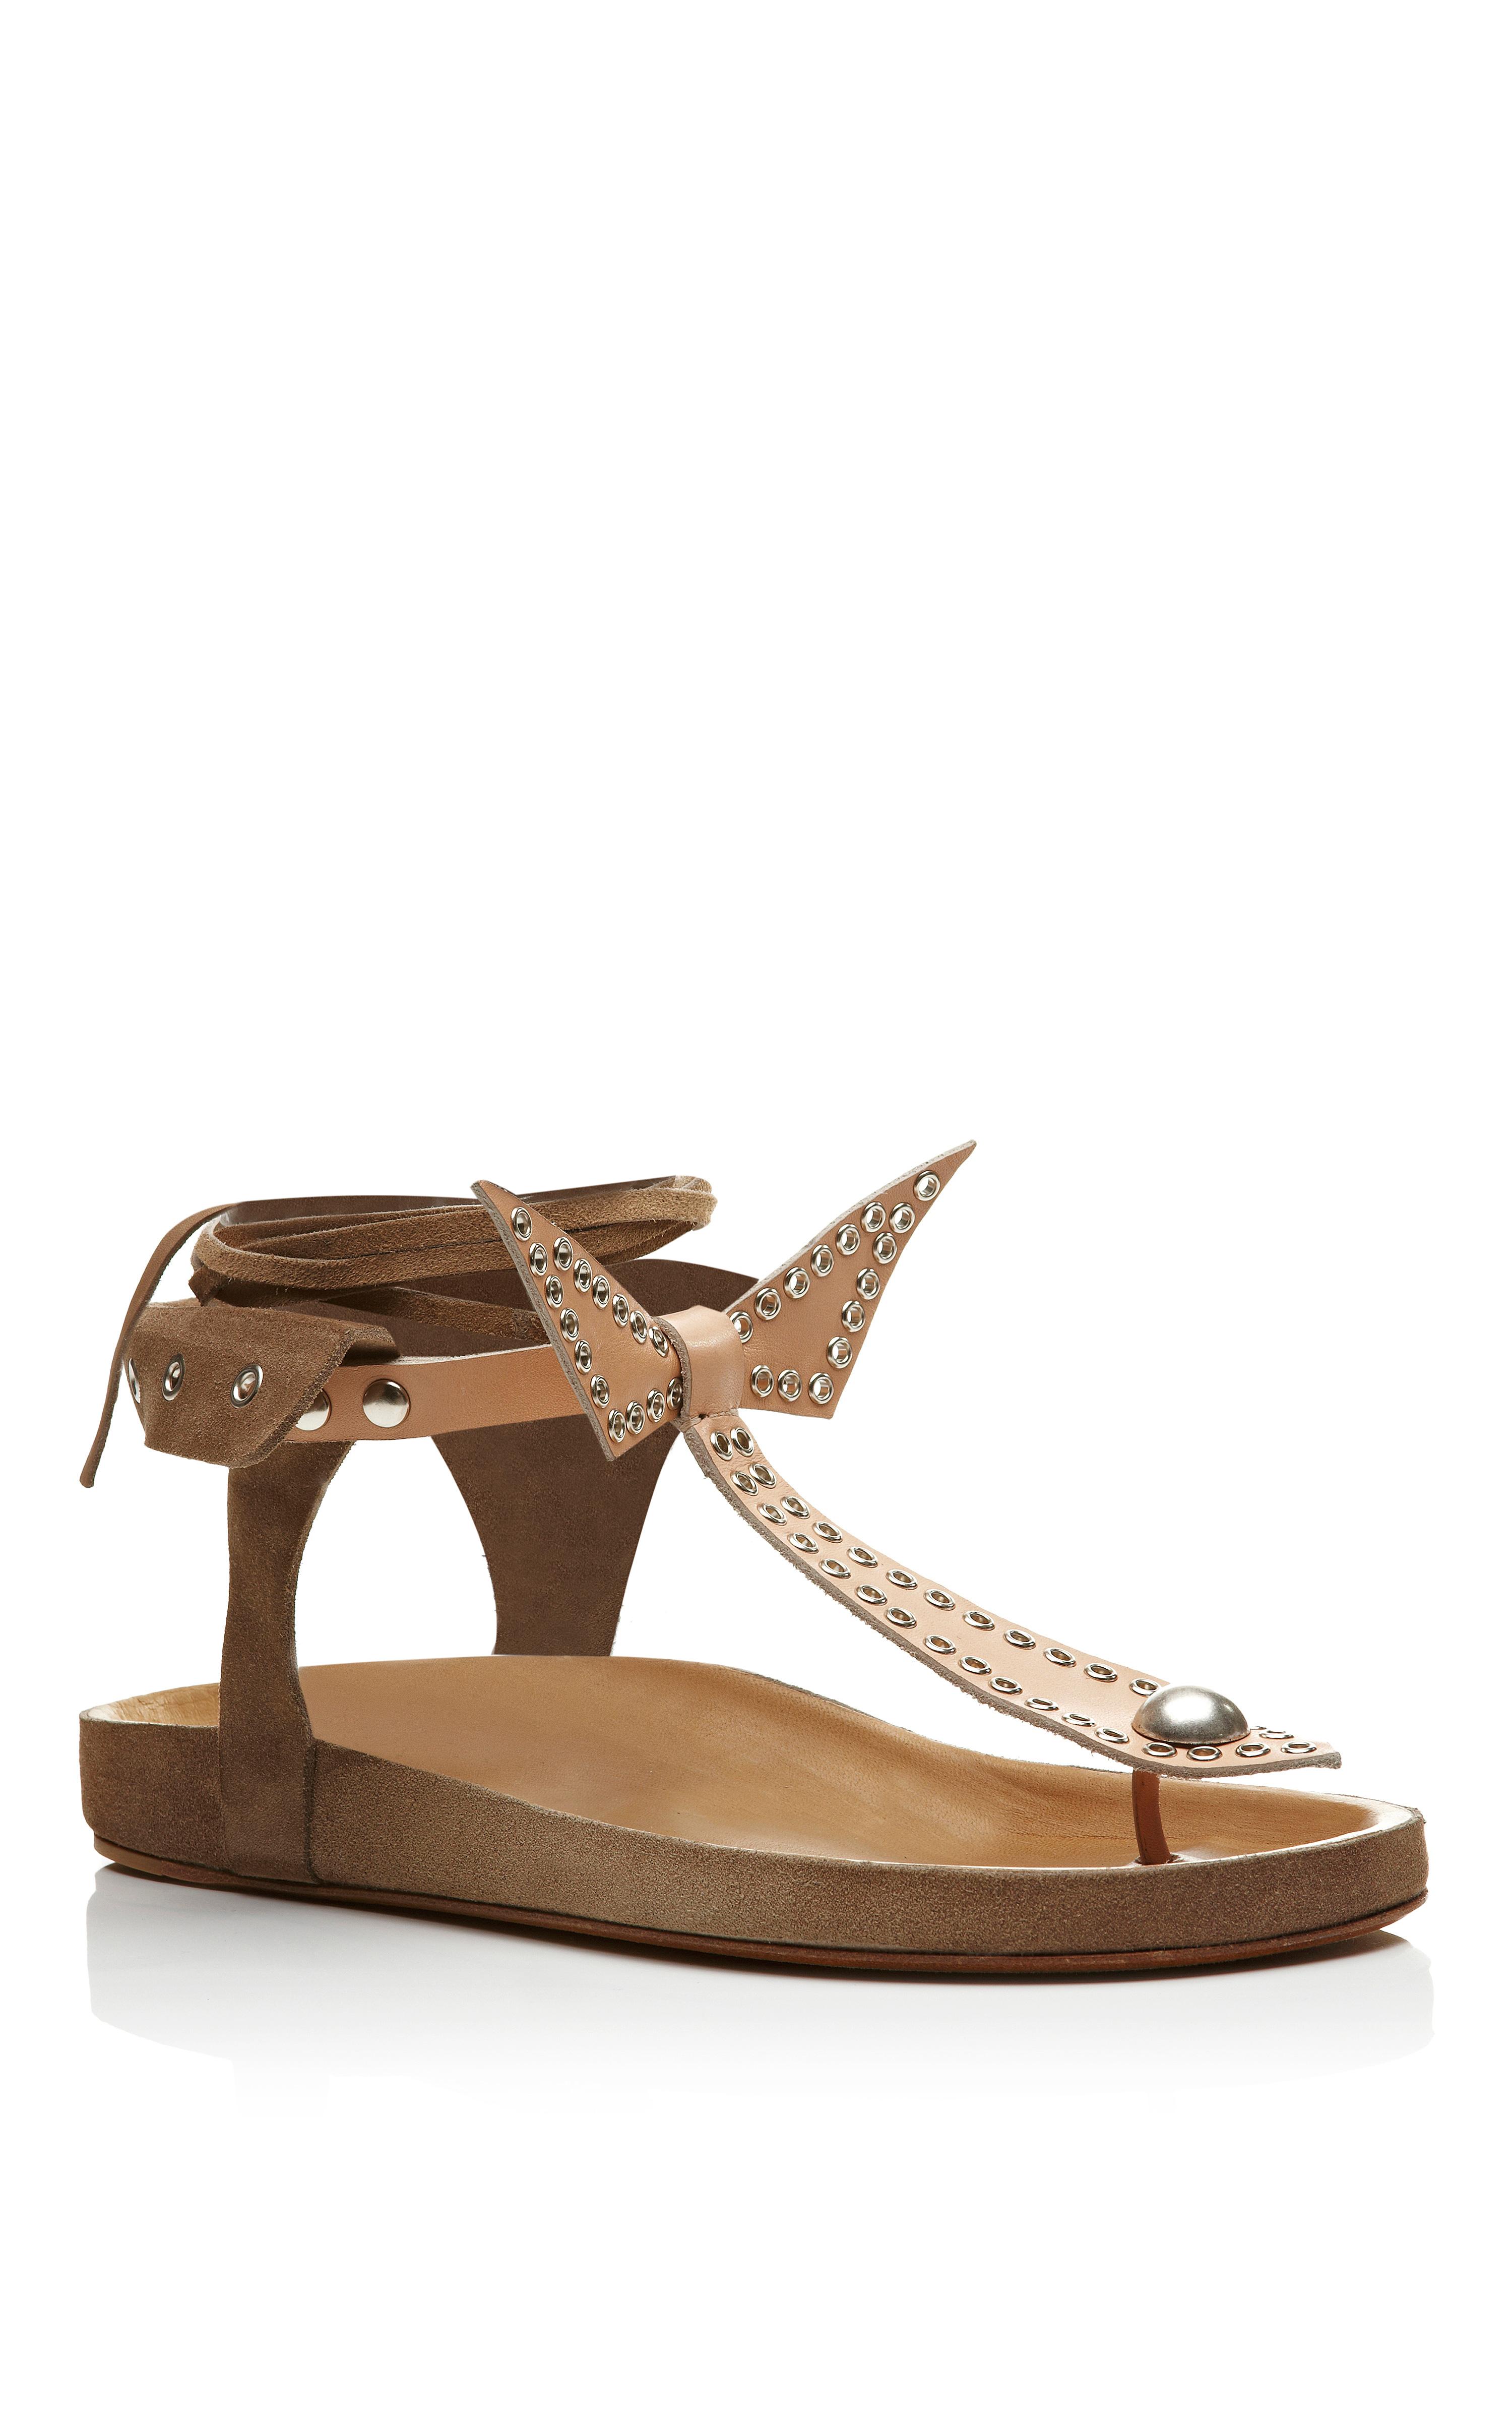 Isabel Marant Women's Jane Cross Over Flat Sandals - Chestnut - UK 4 bsYq3lb